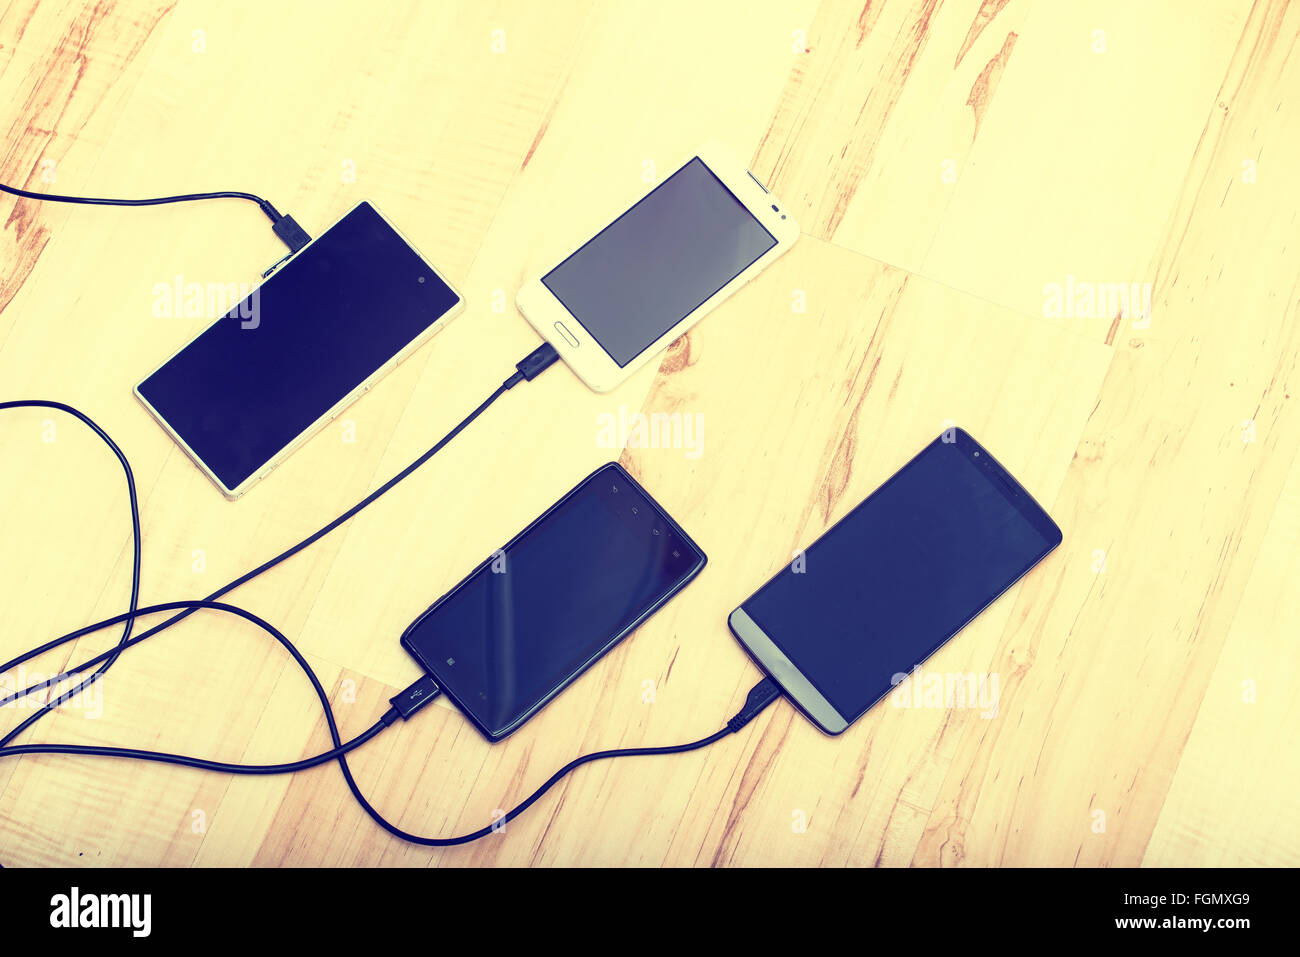 vier Smartphones verbunden mit Ladegeräten Stockbild